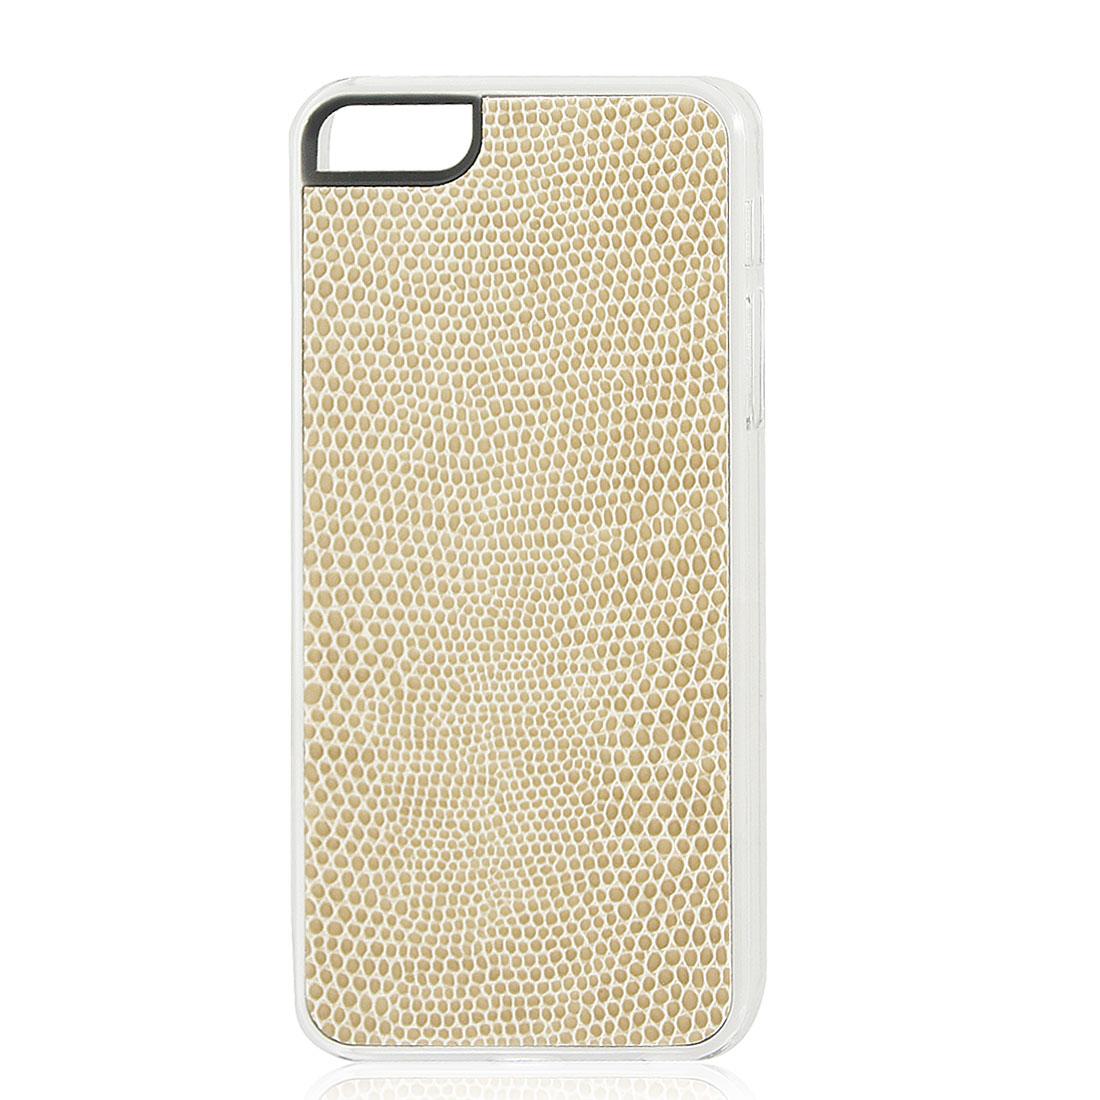 Khaki Snake Pattern Hard Back Case Cover Skin for iPhone 5 5